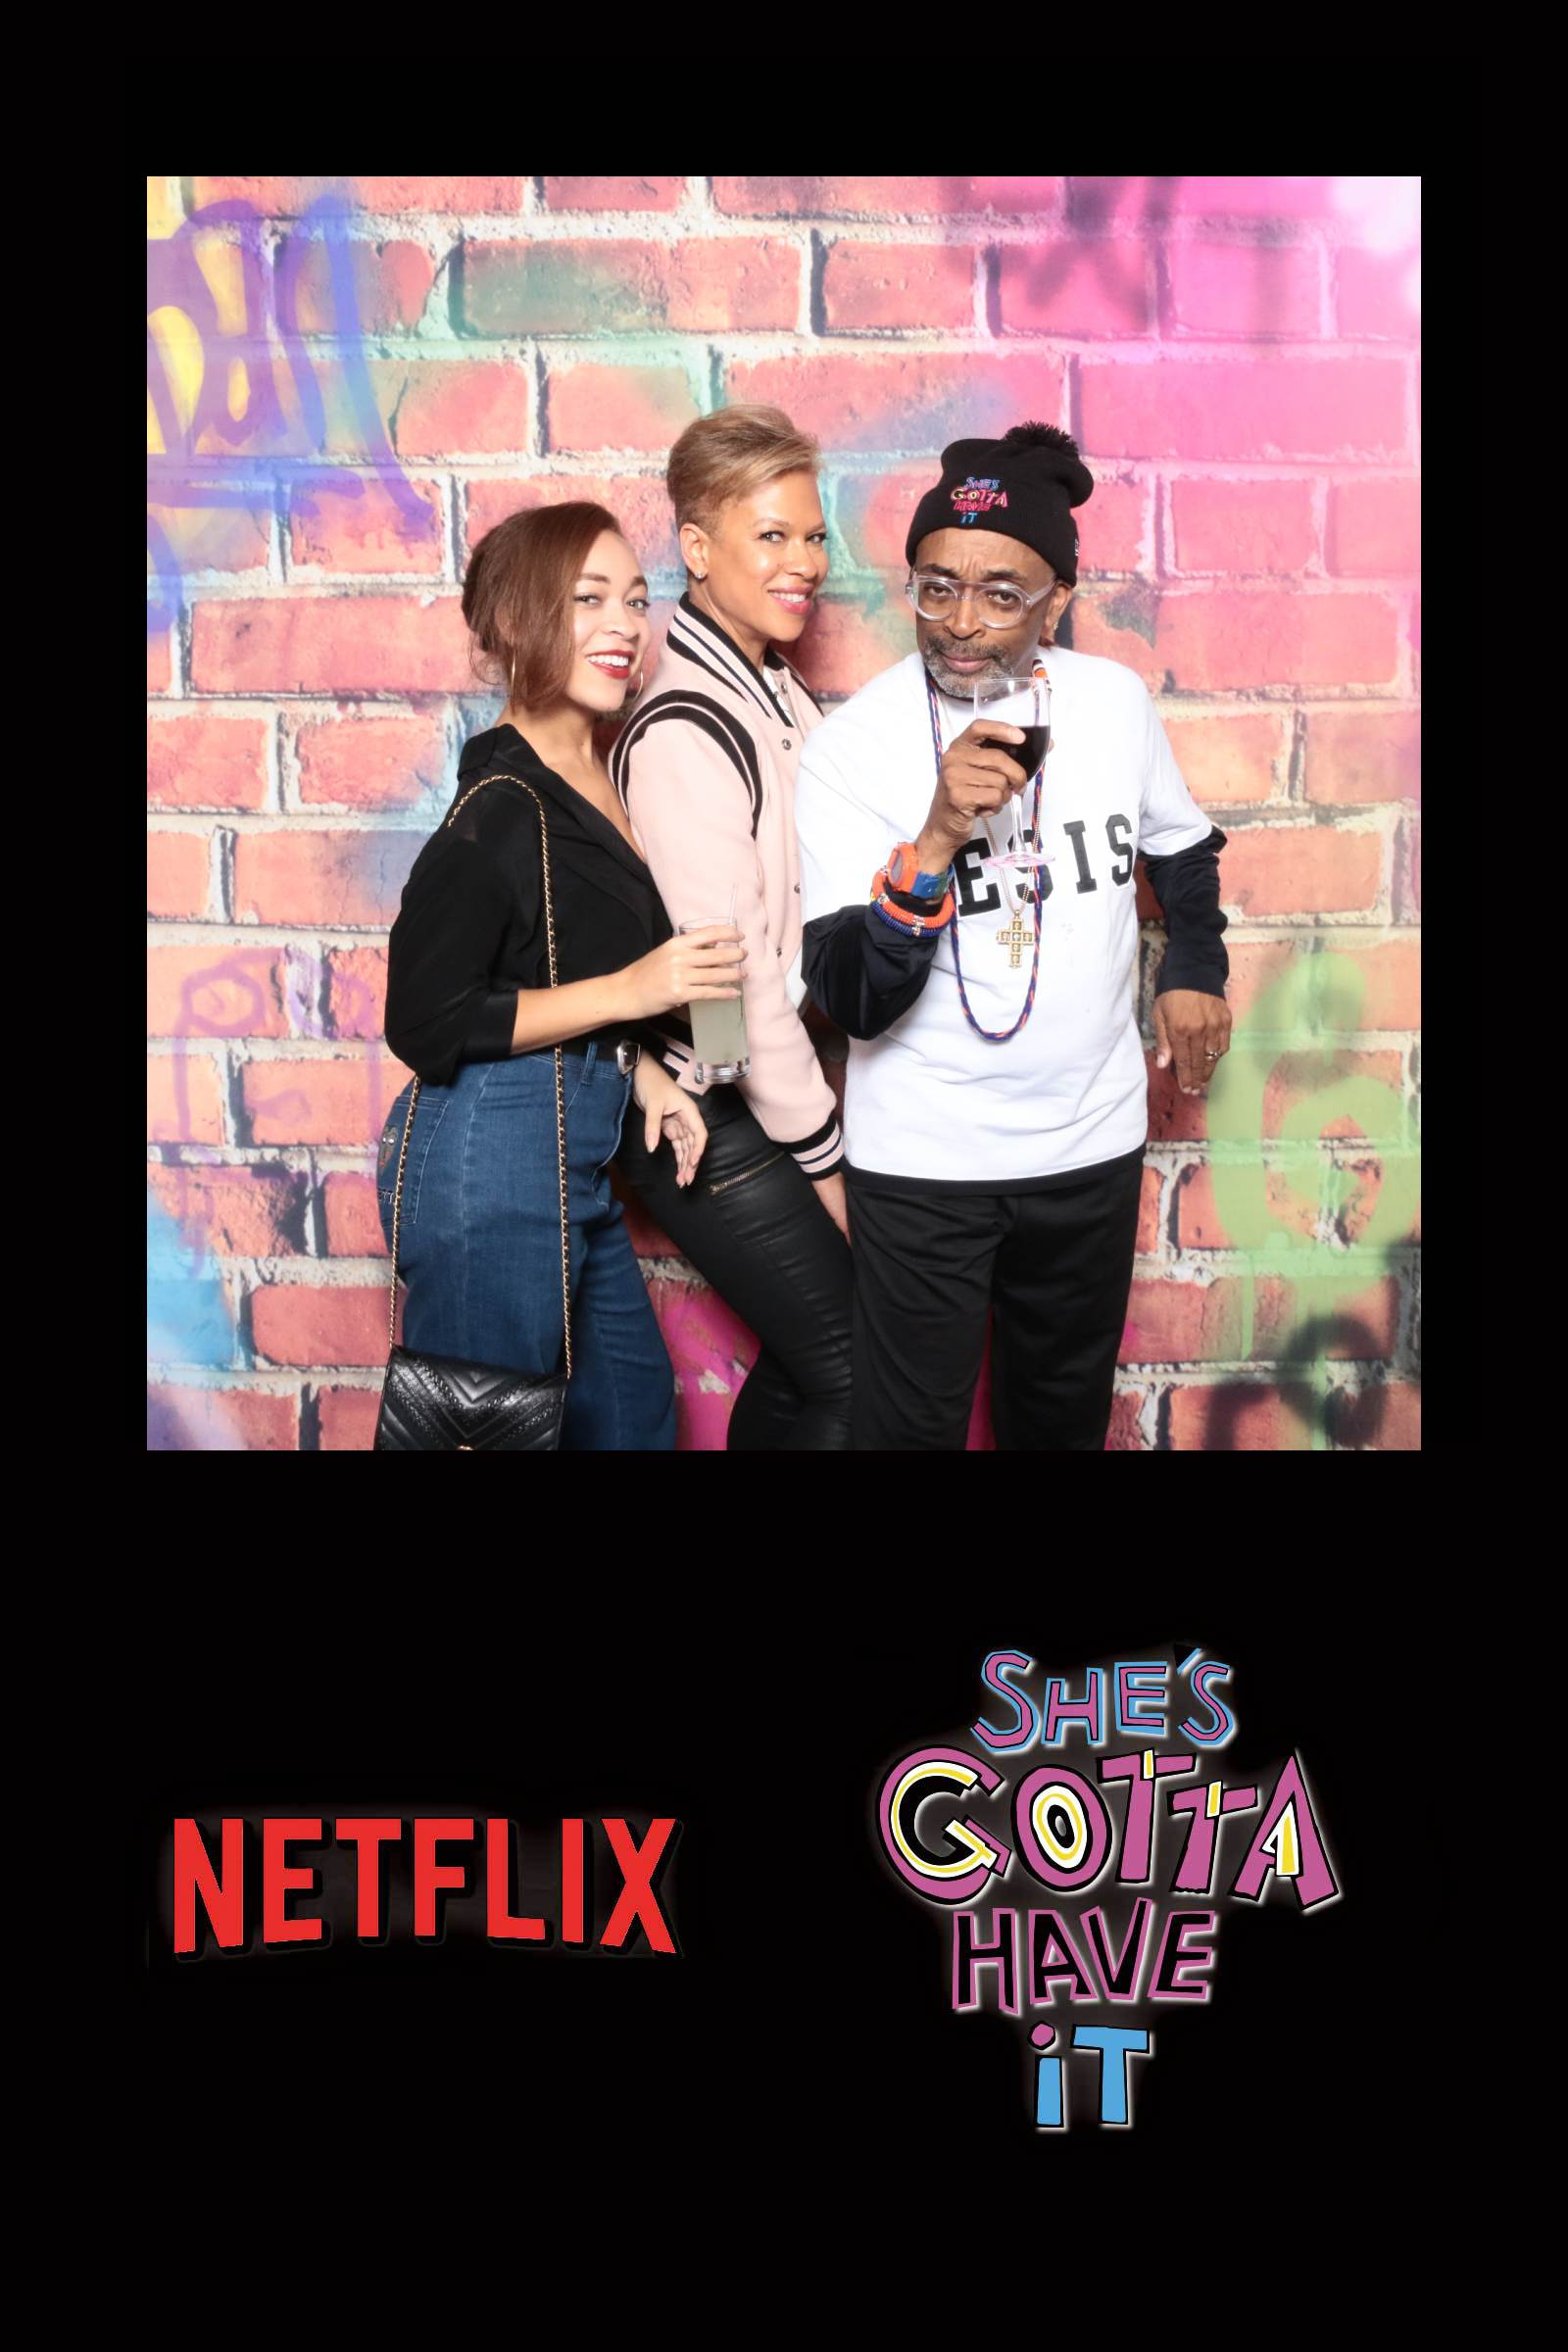 Netflix Premiere of She's Gotta Have It | The Bosco | New